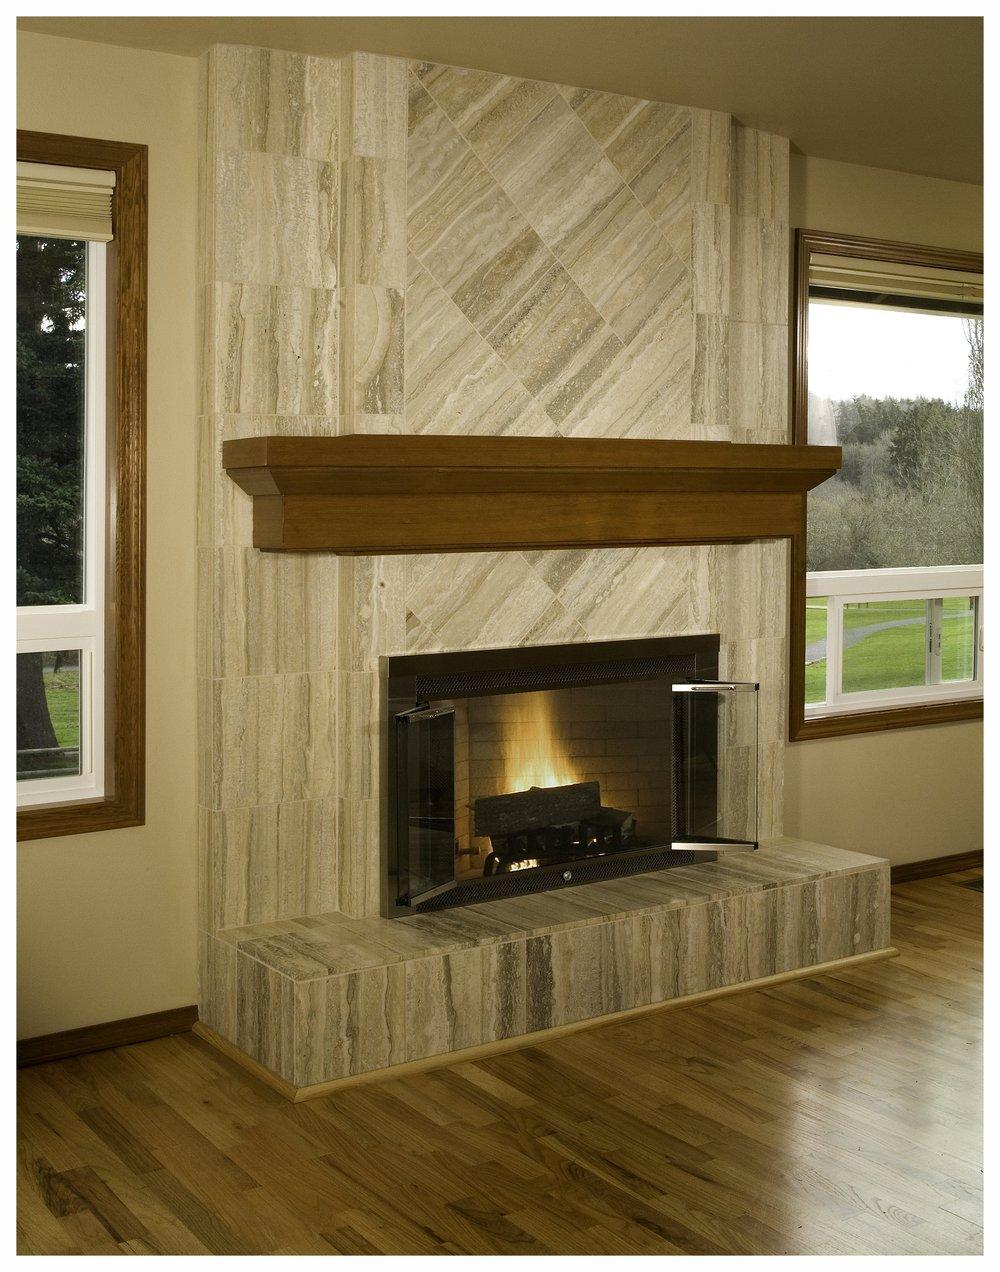 Fireplace 6.jpg